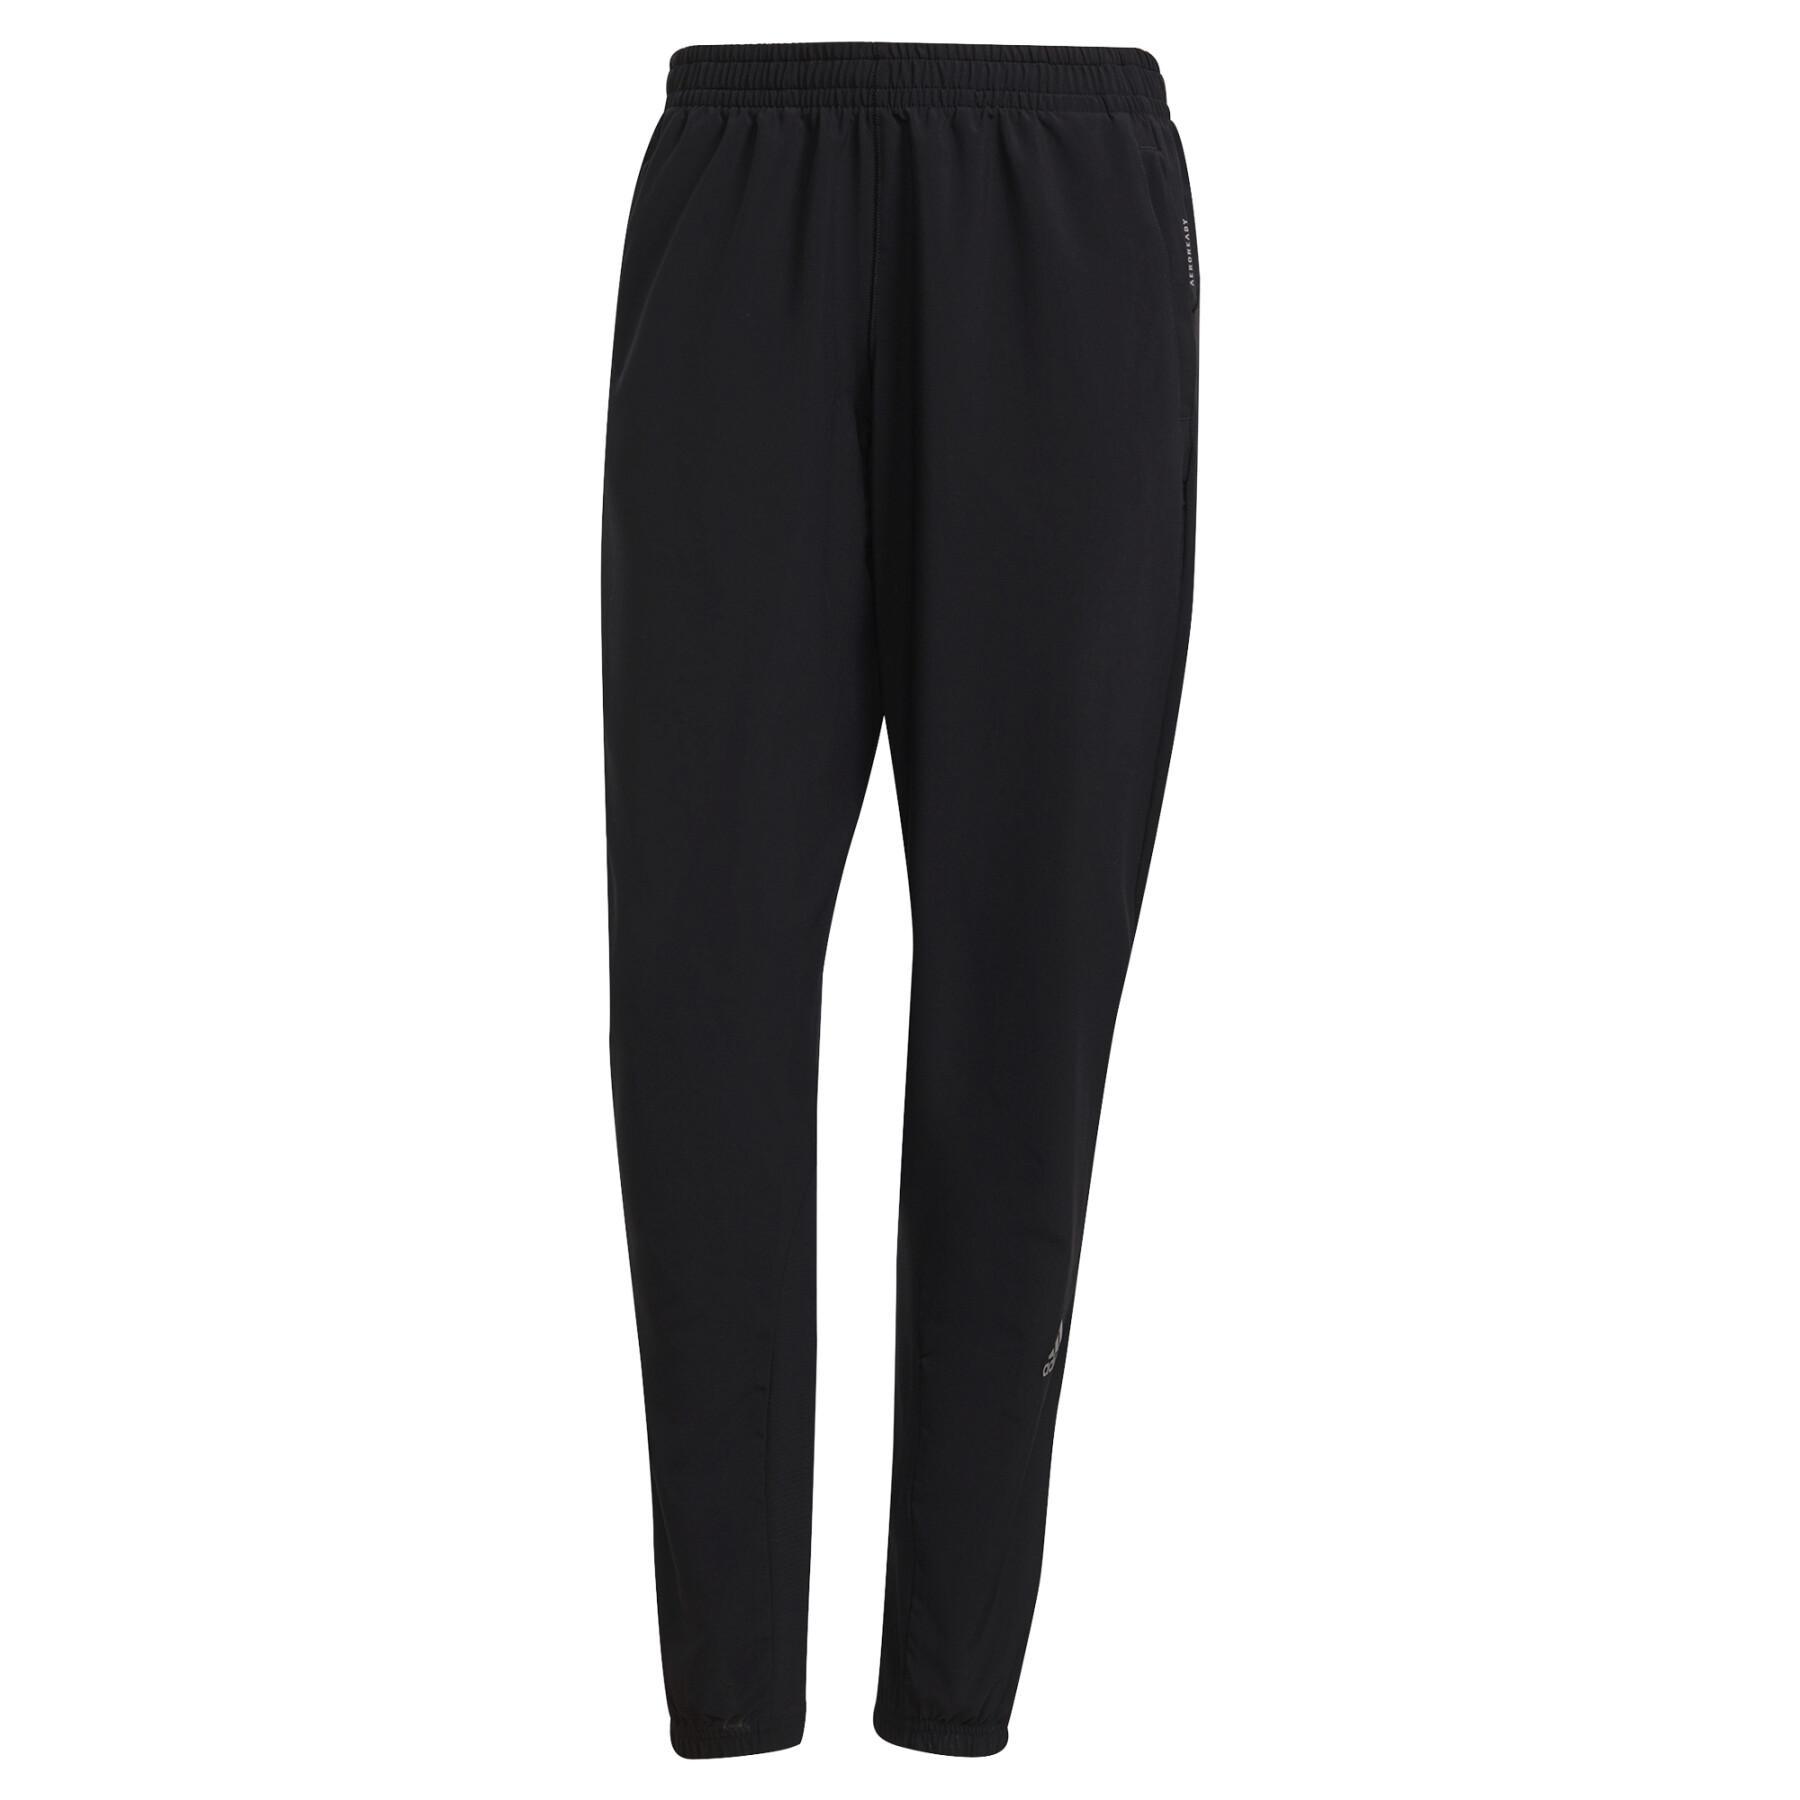 Women's trousers adidas Fast Running